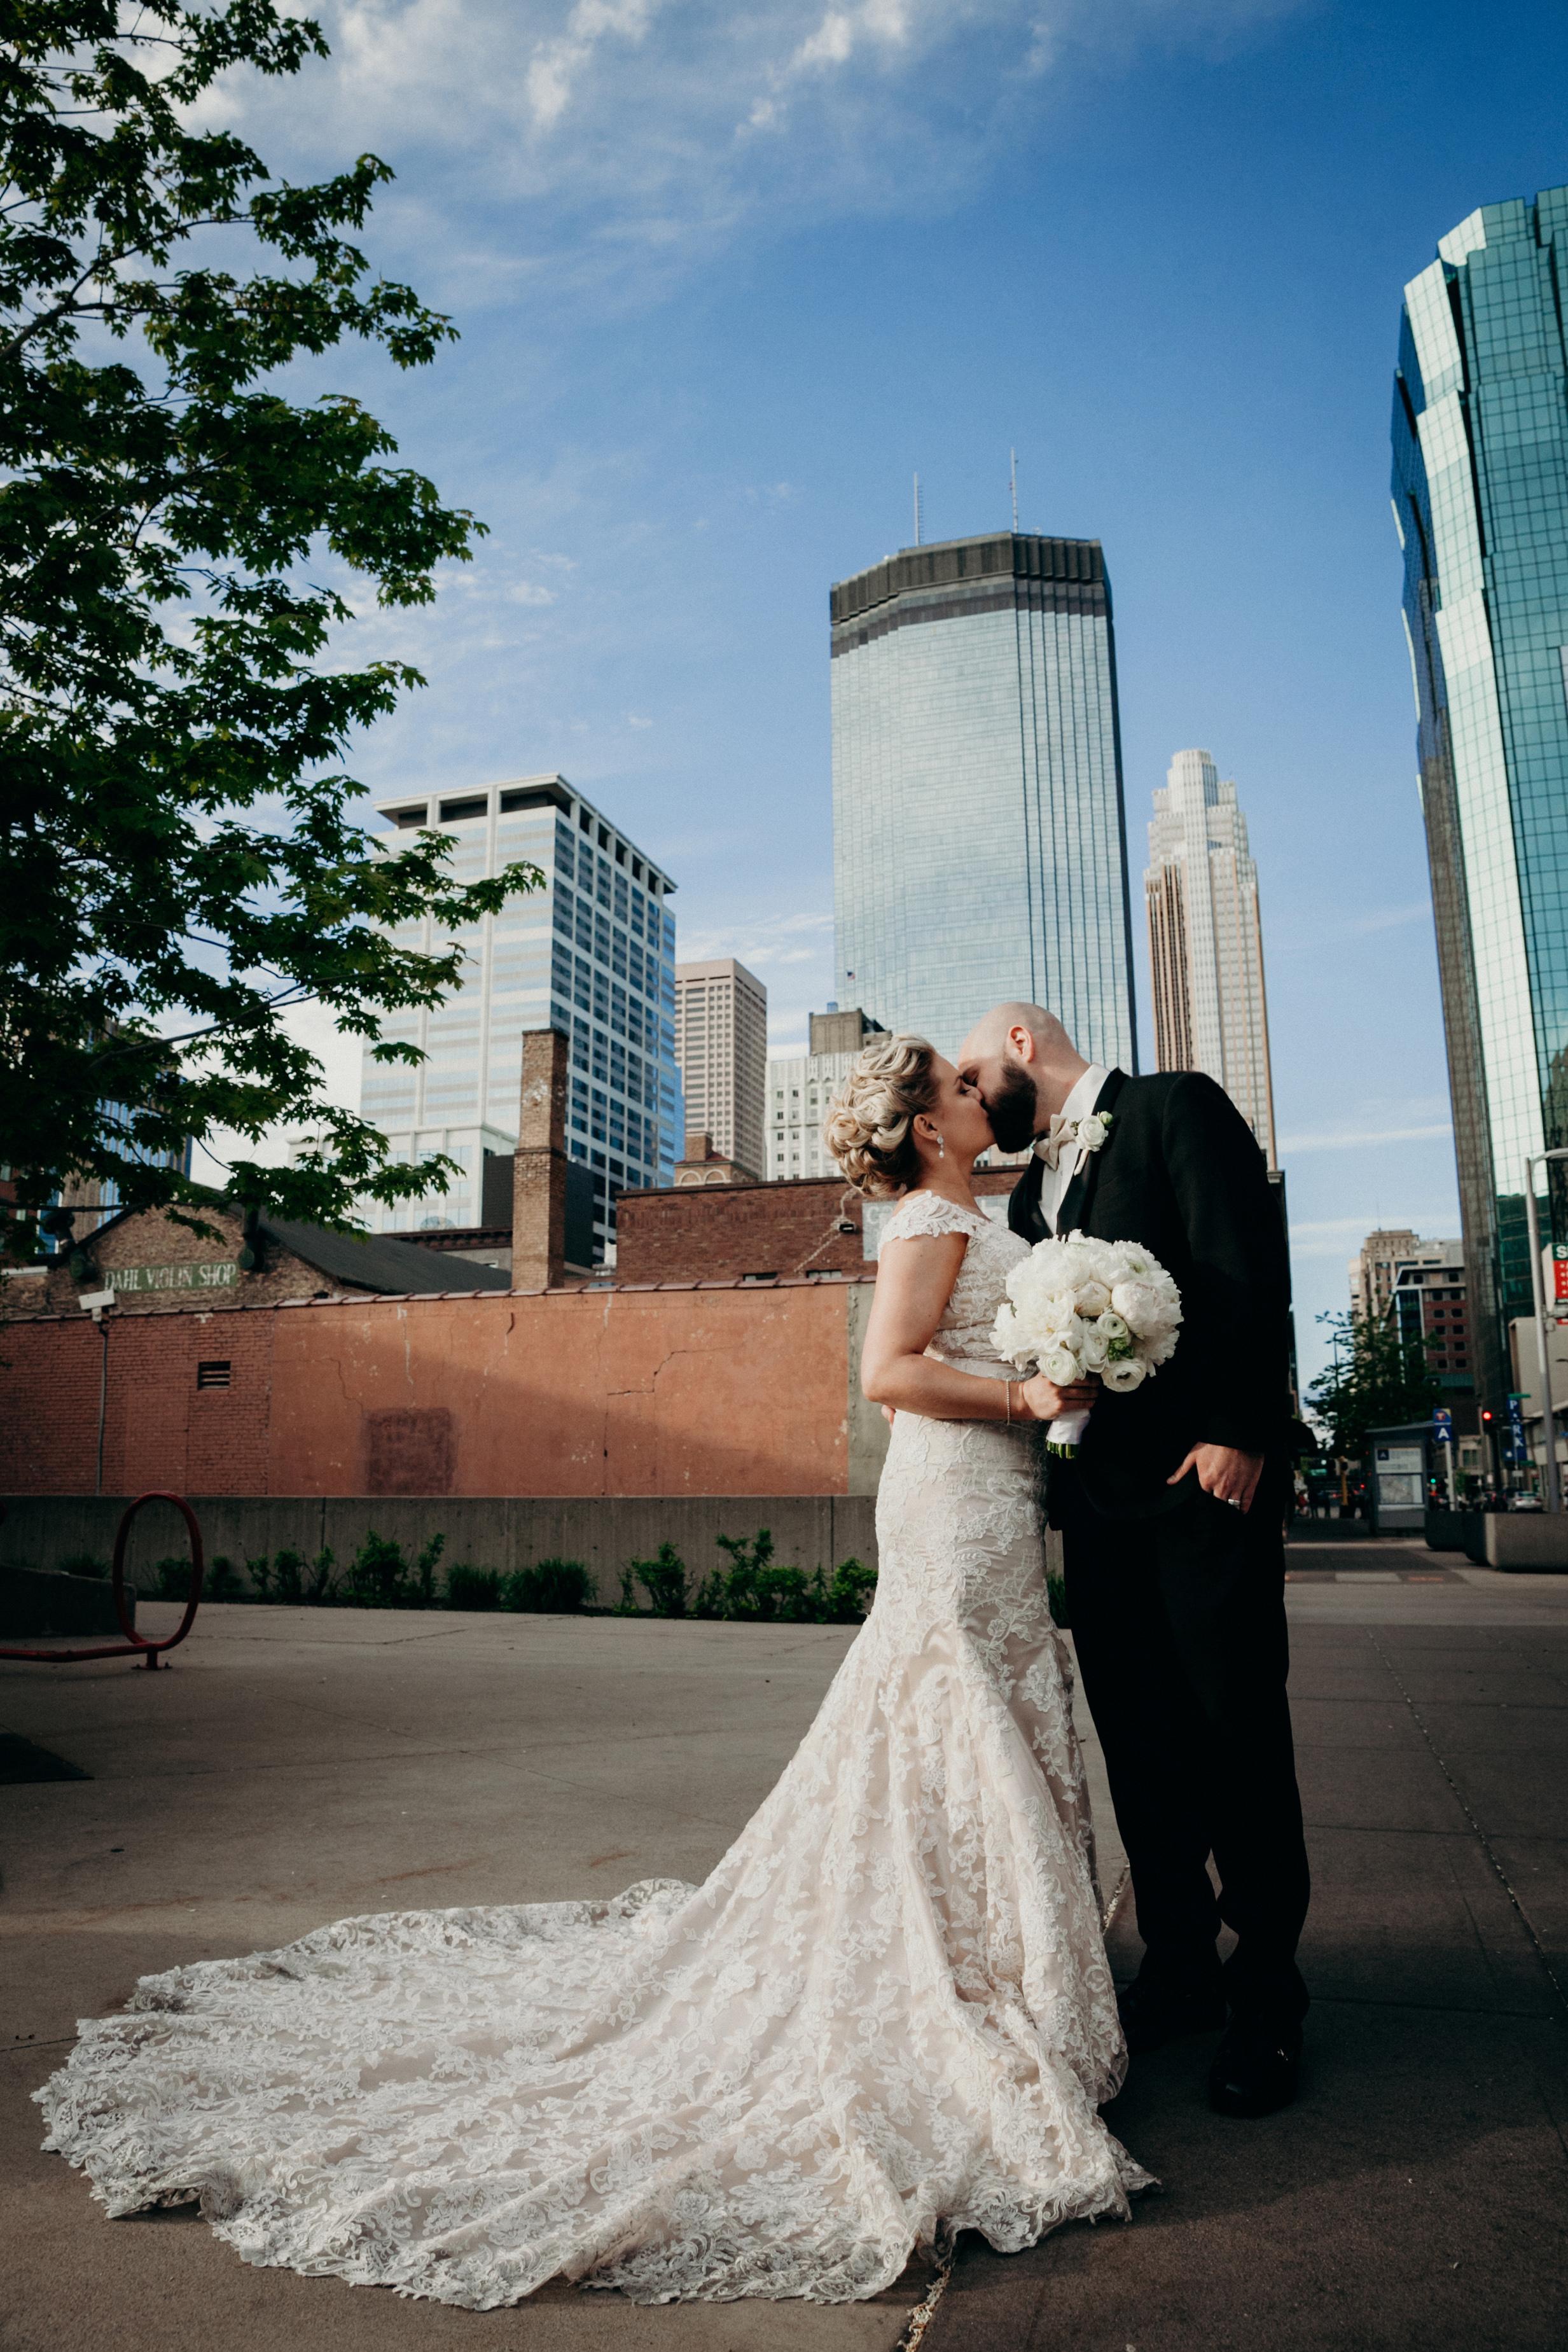 Desiree + Paul - Hotel Ivy & Foshay Tower, Minneapolis